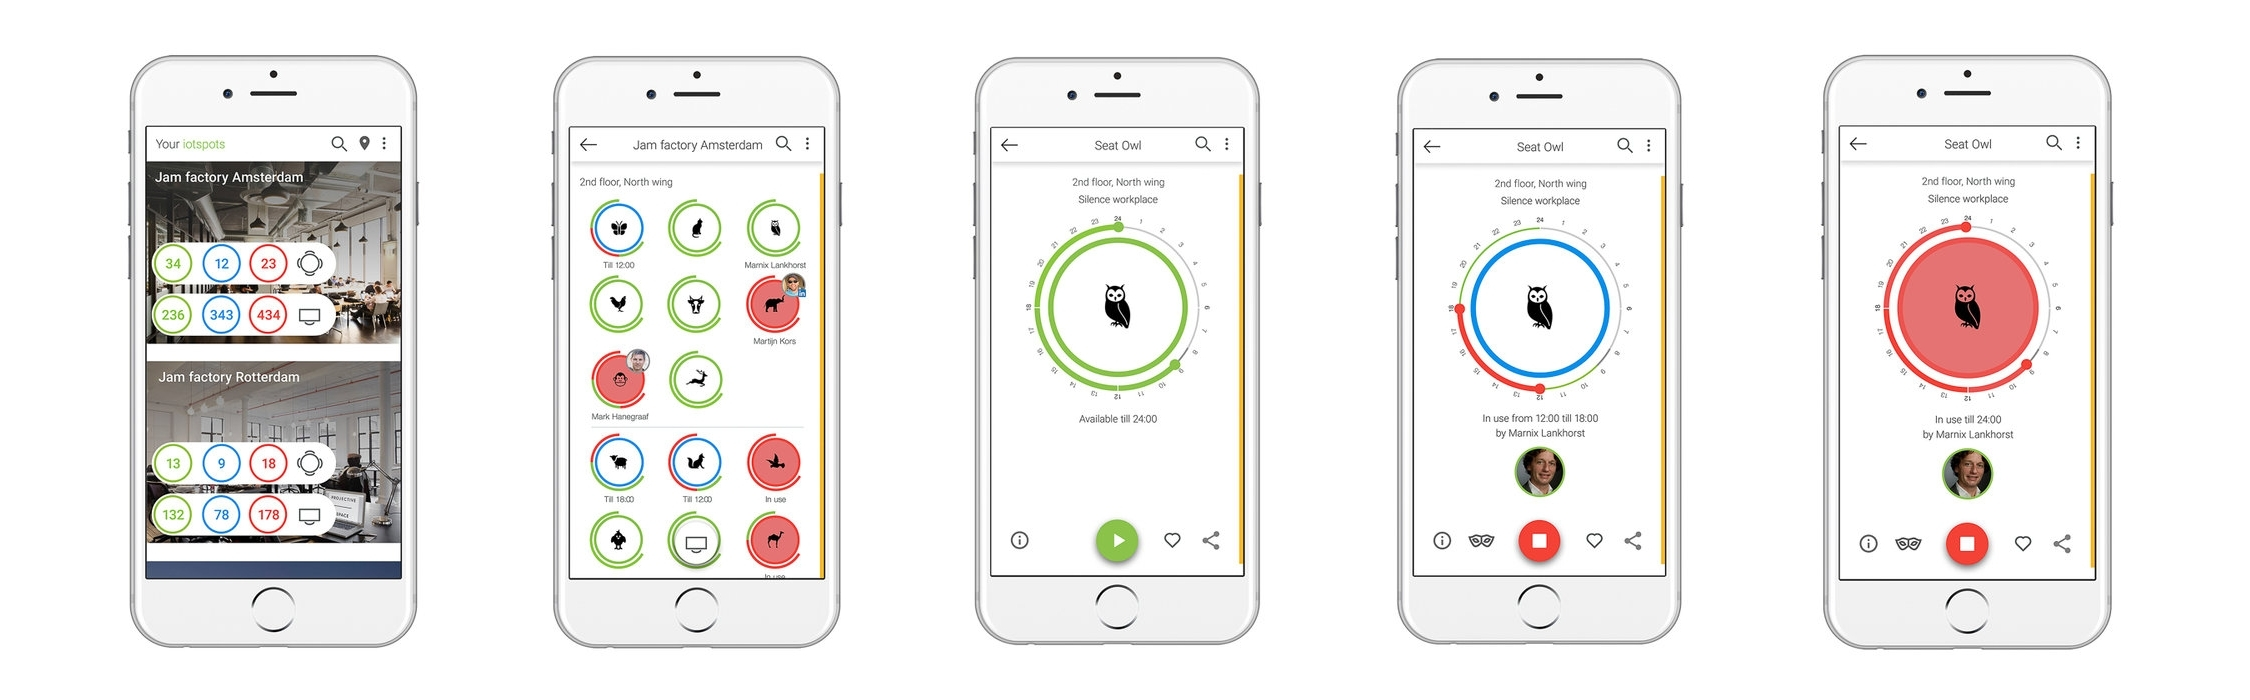 iotspot agile working app.jpg